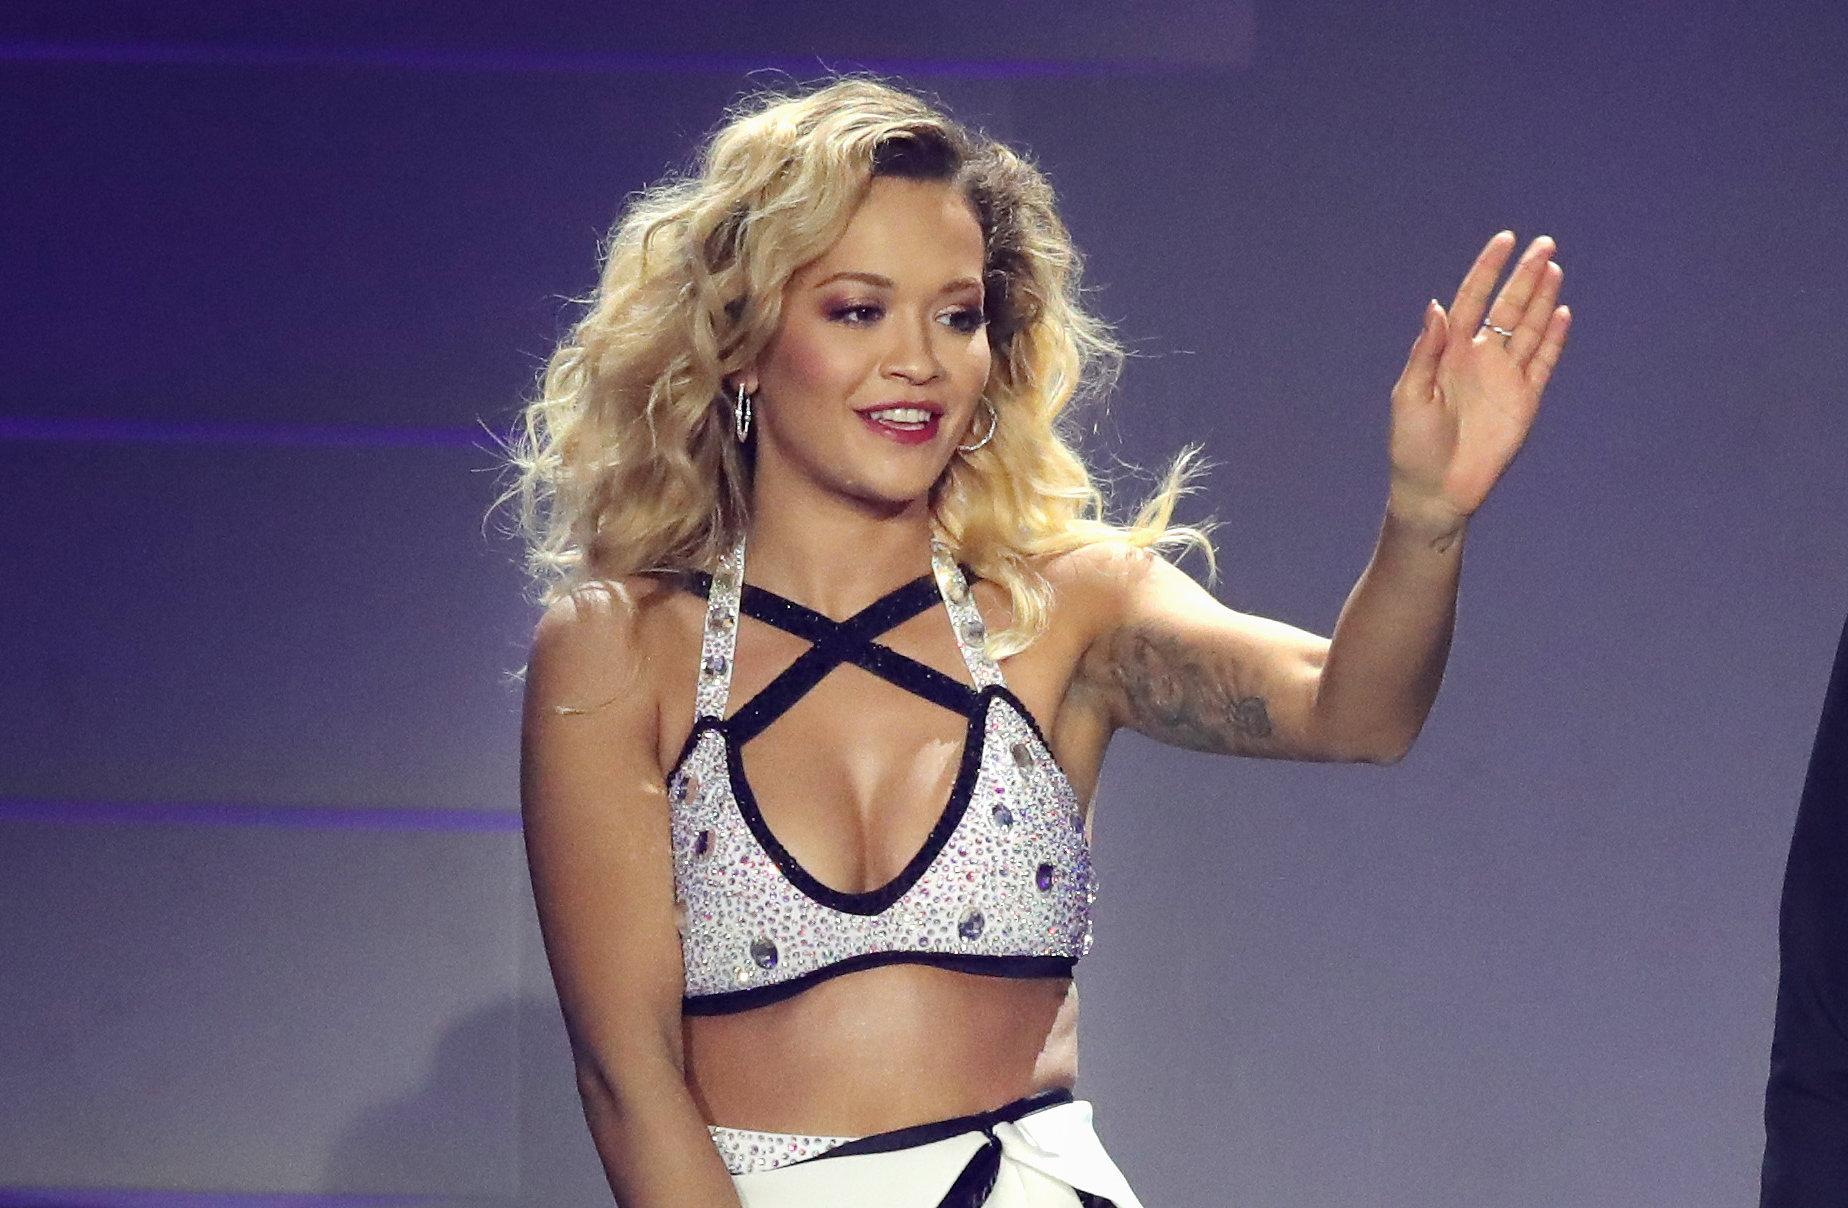 Gal Gadot Fully Nude Assault,Farrah fawcett Adult fotos Abbey Clancy hot. 2018-2019 celebrityes photos leaks!,X Factor Betting Odds: Ray Quinn Eton Road